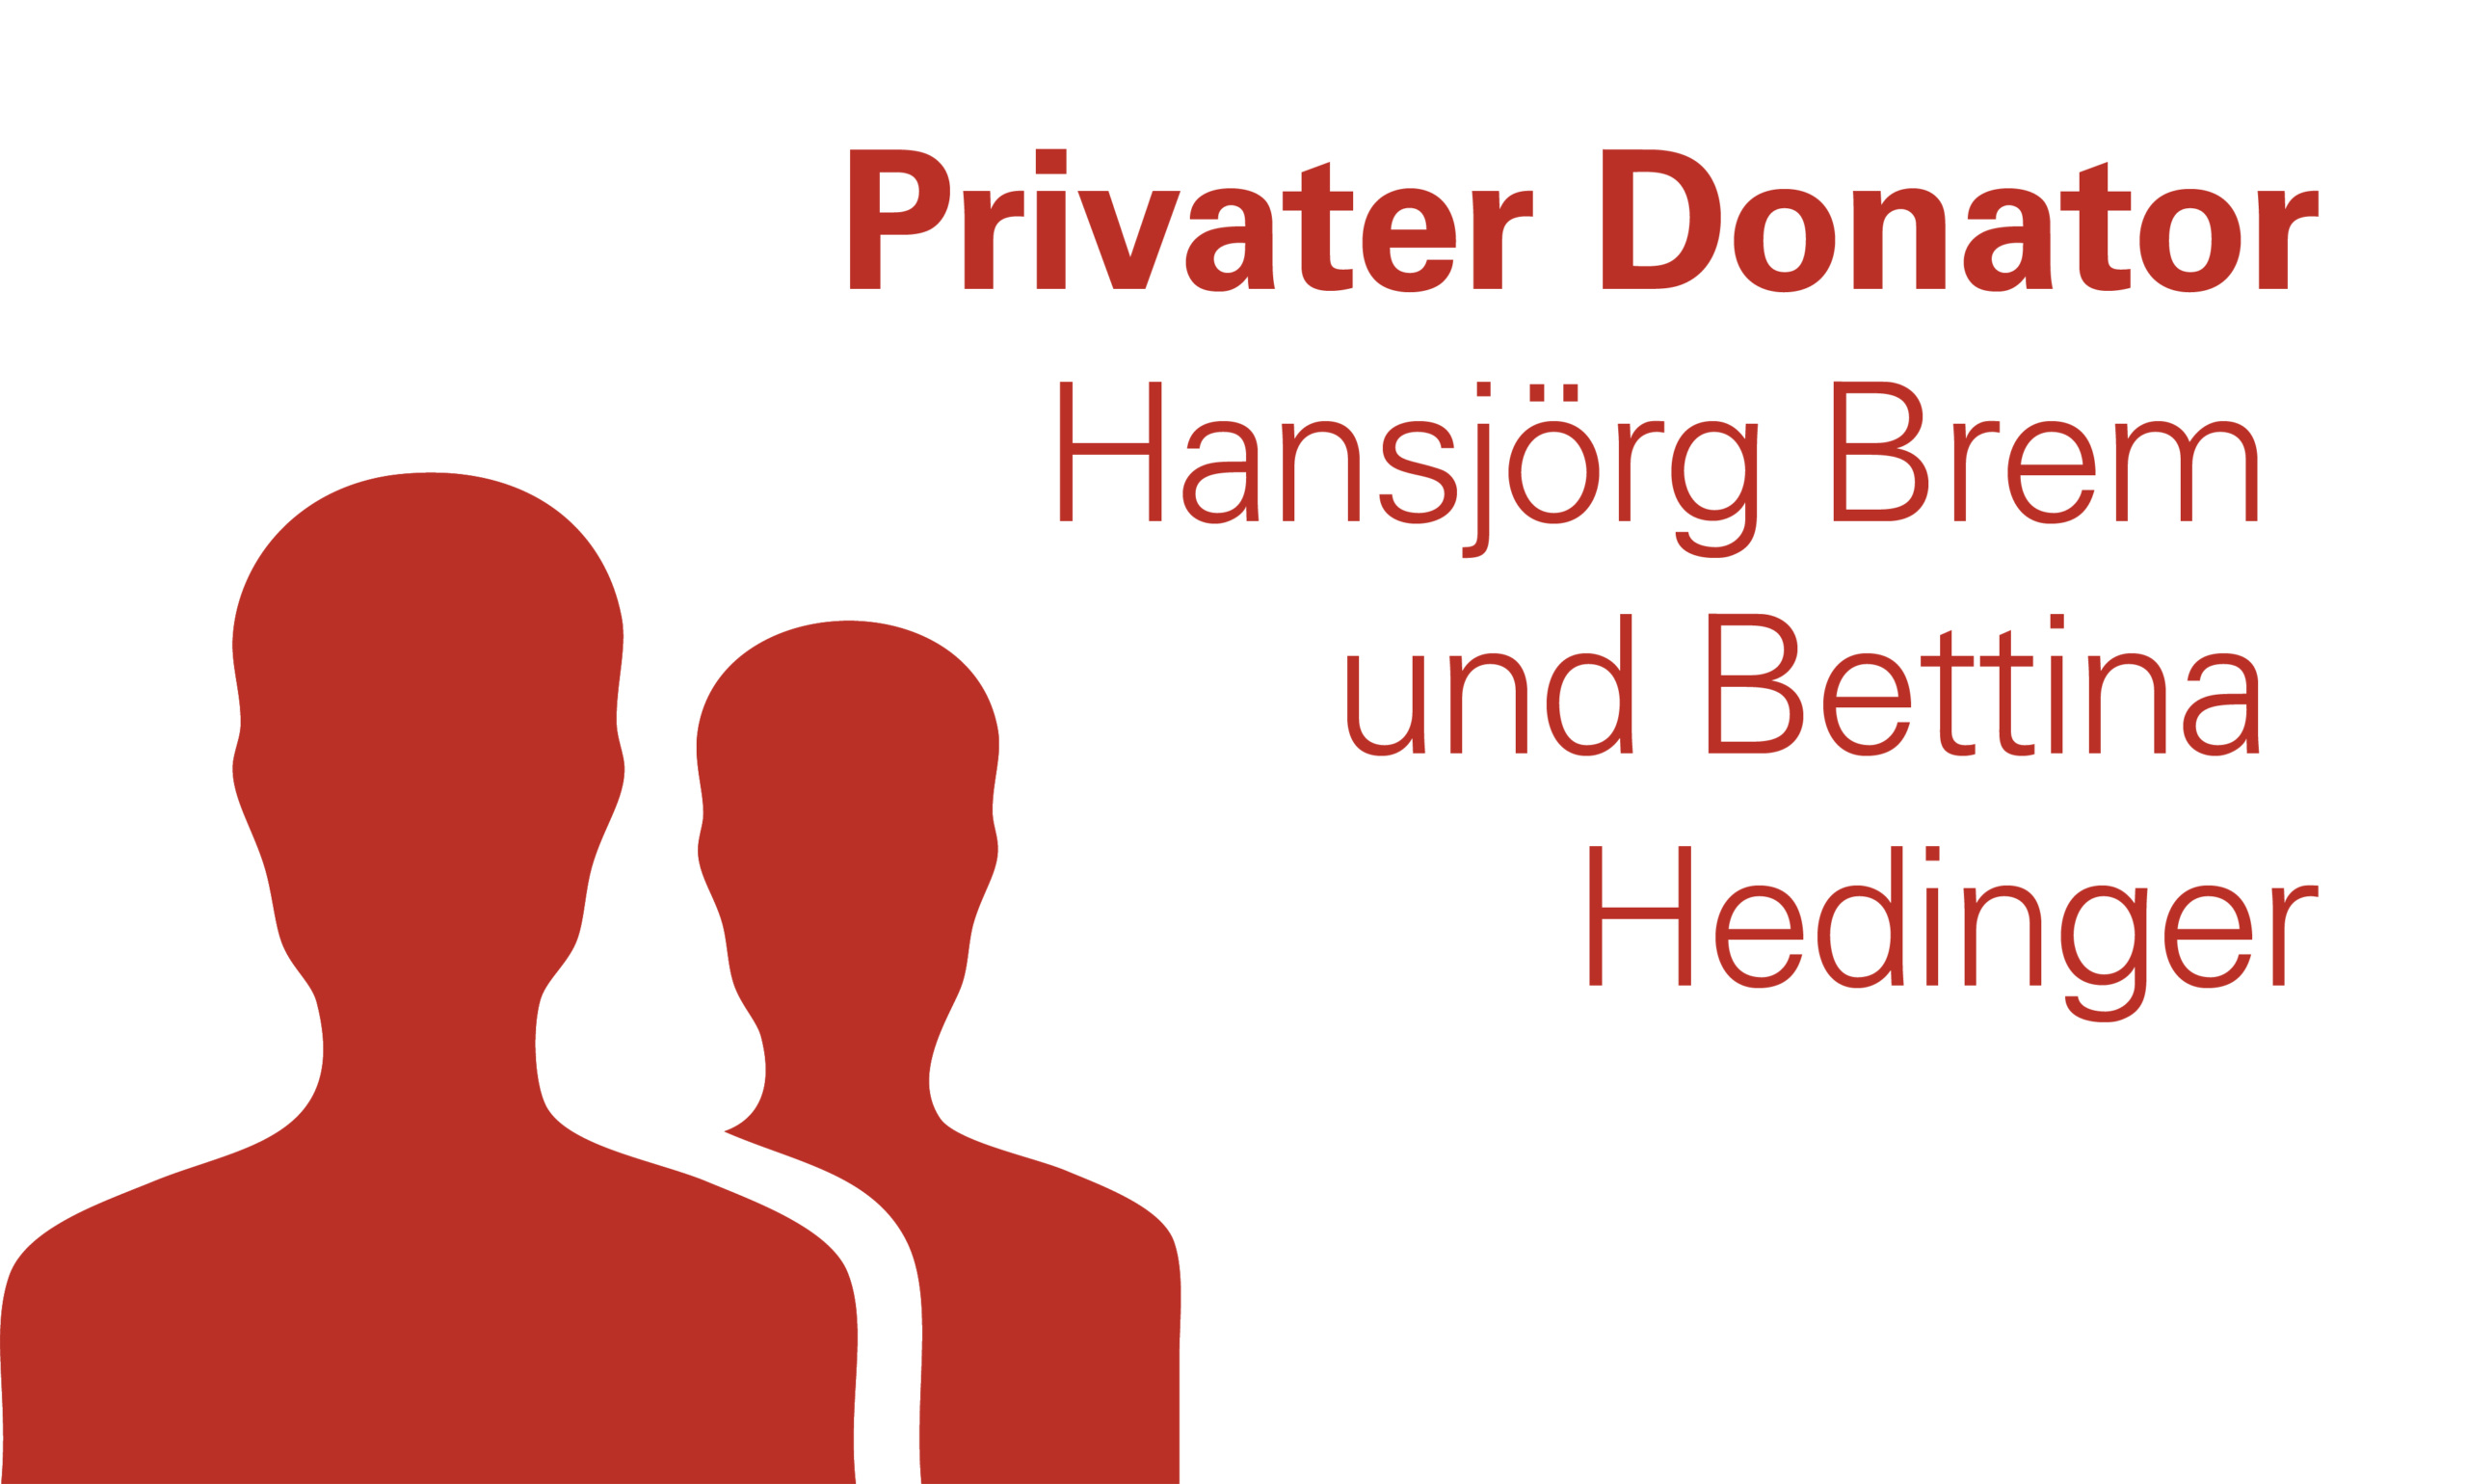 Hansjoerg Brem und Bettina Hedinger